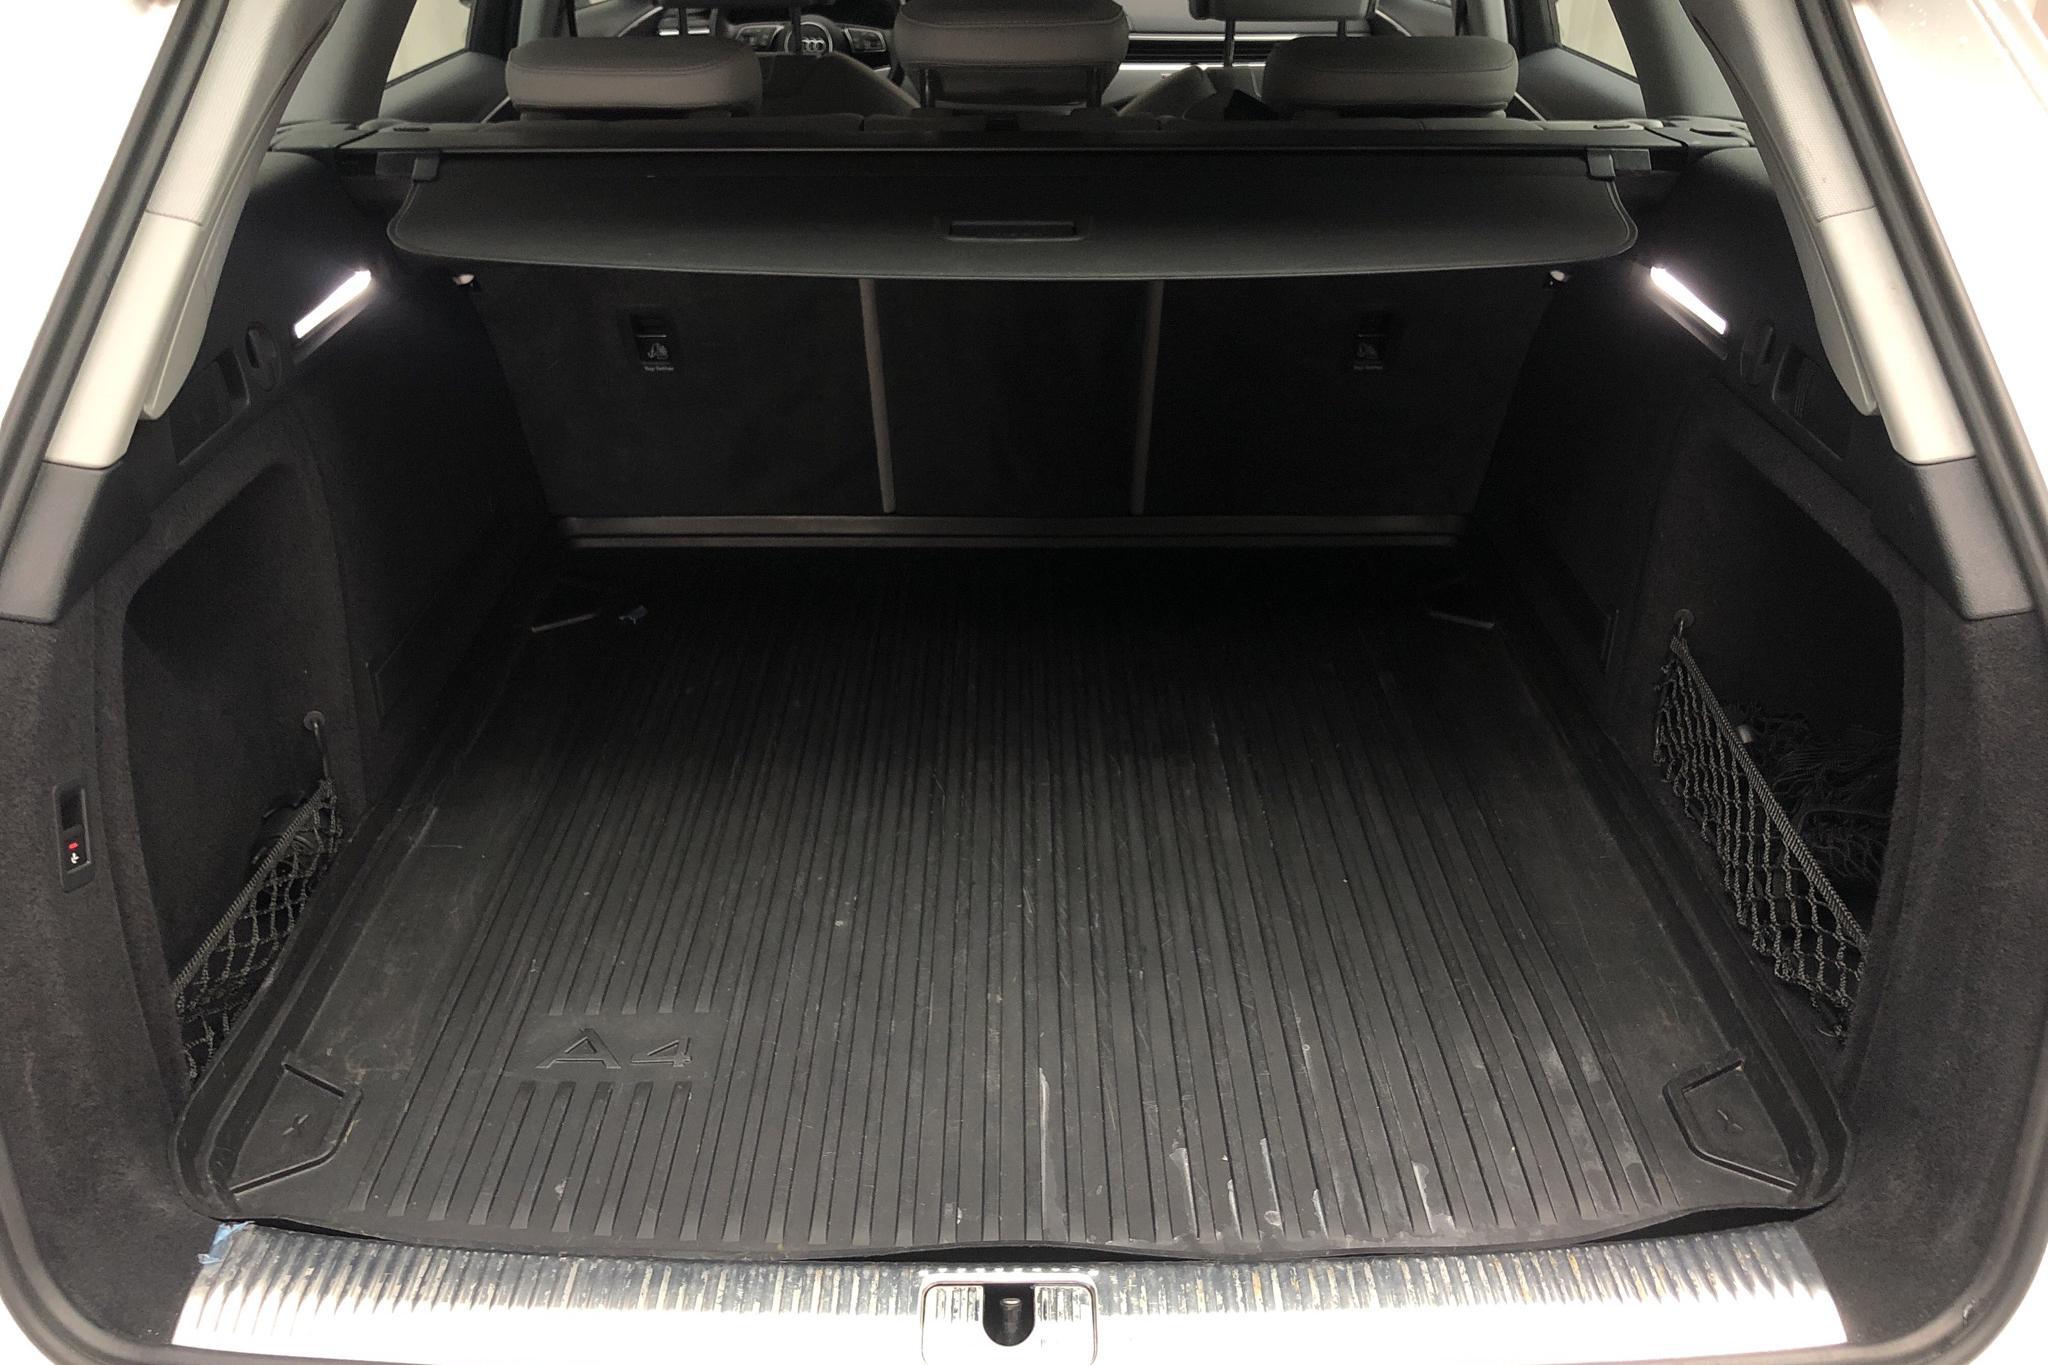 Audi A4 Avant 40 TDI quattro (190hk) - 44 400 km - Automatic - white - 2019